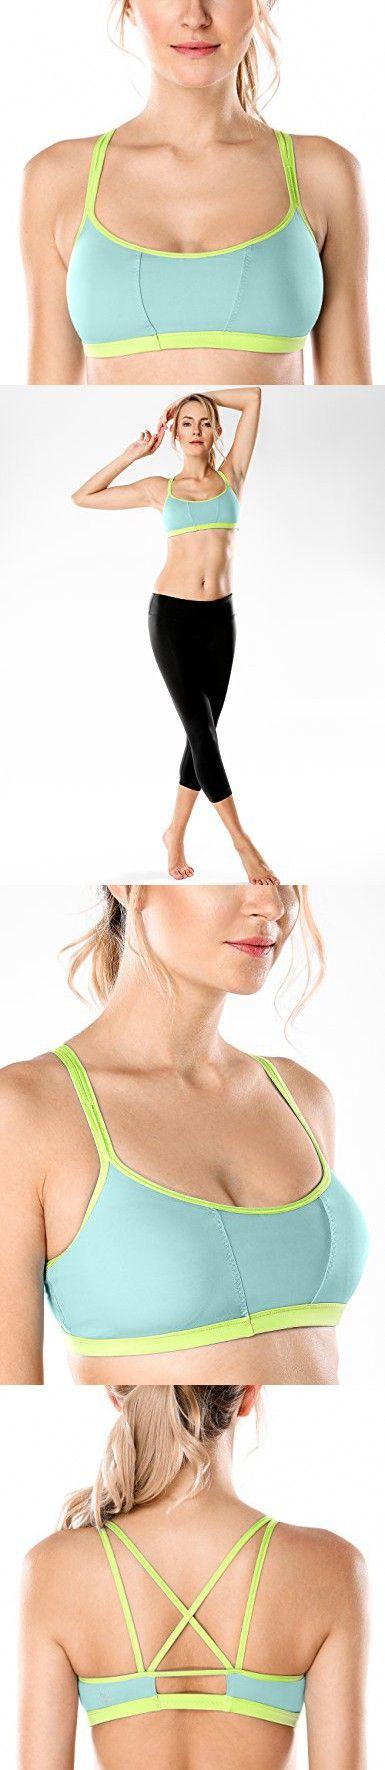 94aa4bfc9fc0c CRZ YOGA Women s Padded Cool-look Criss Cross Strappy Yoga Sports Bra  Multicoloured  8